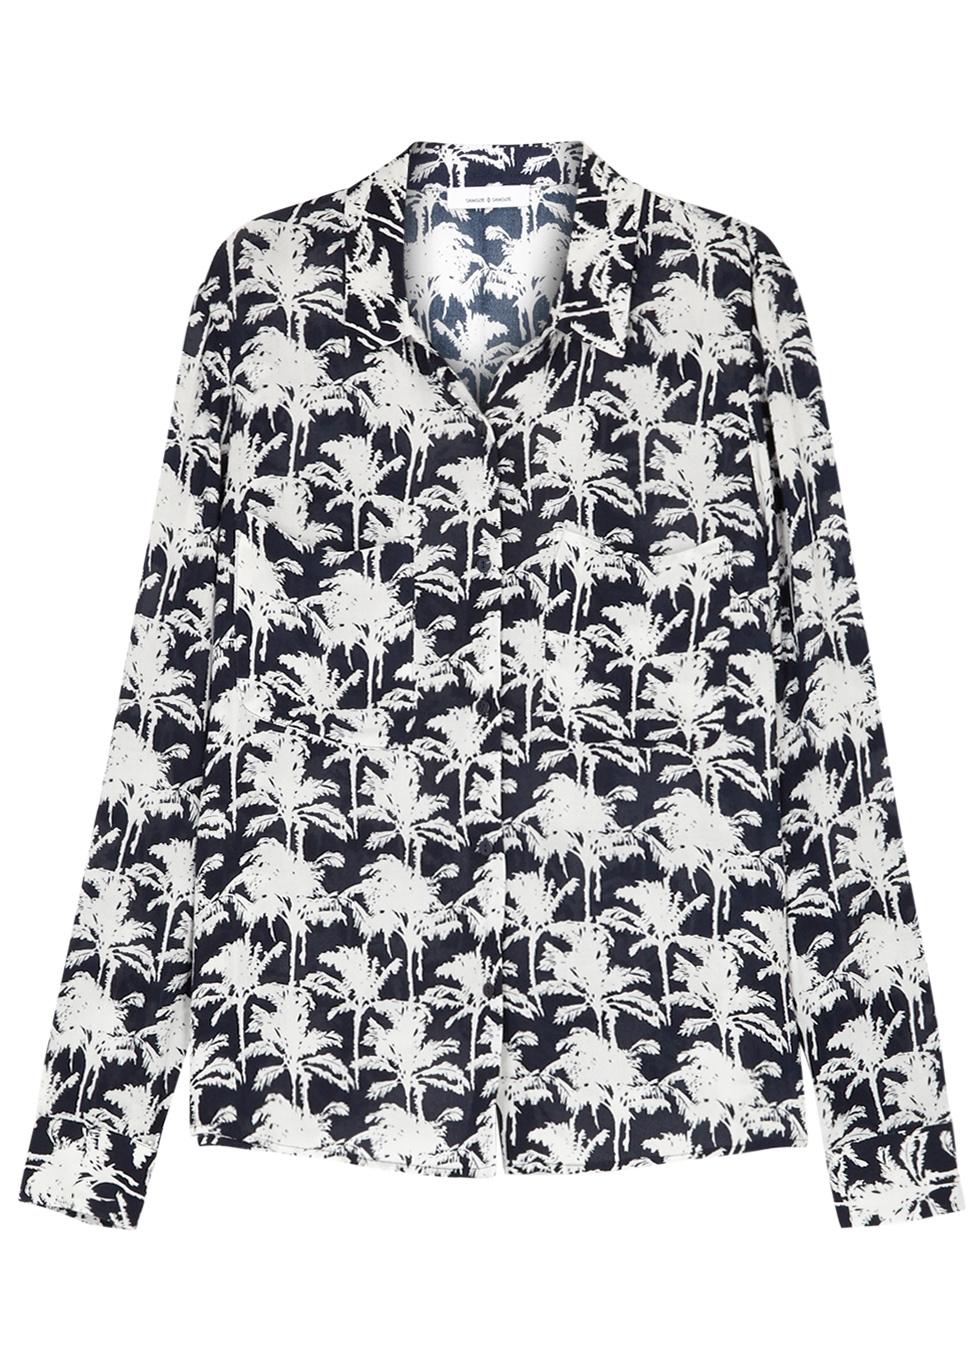 SAMS0E & SAMS0E Milly Printed Jersey Shirt in Blue